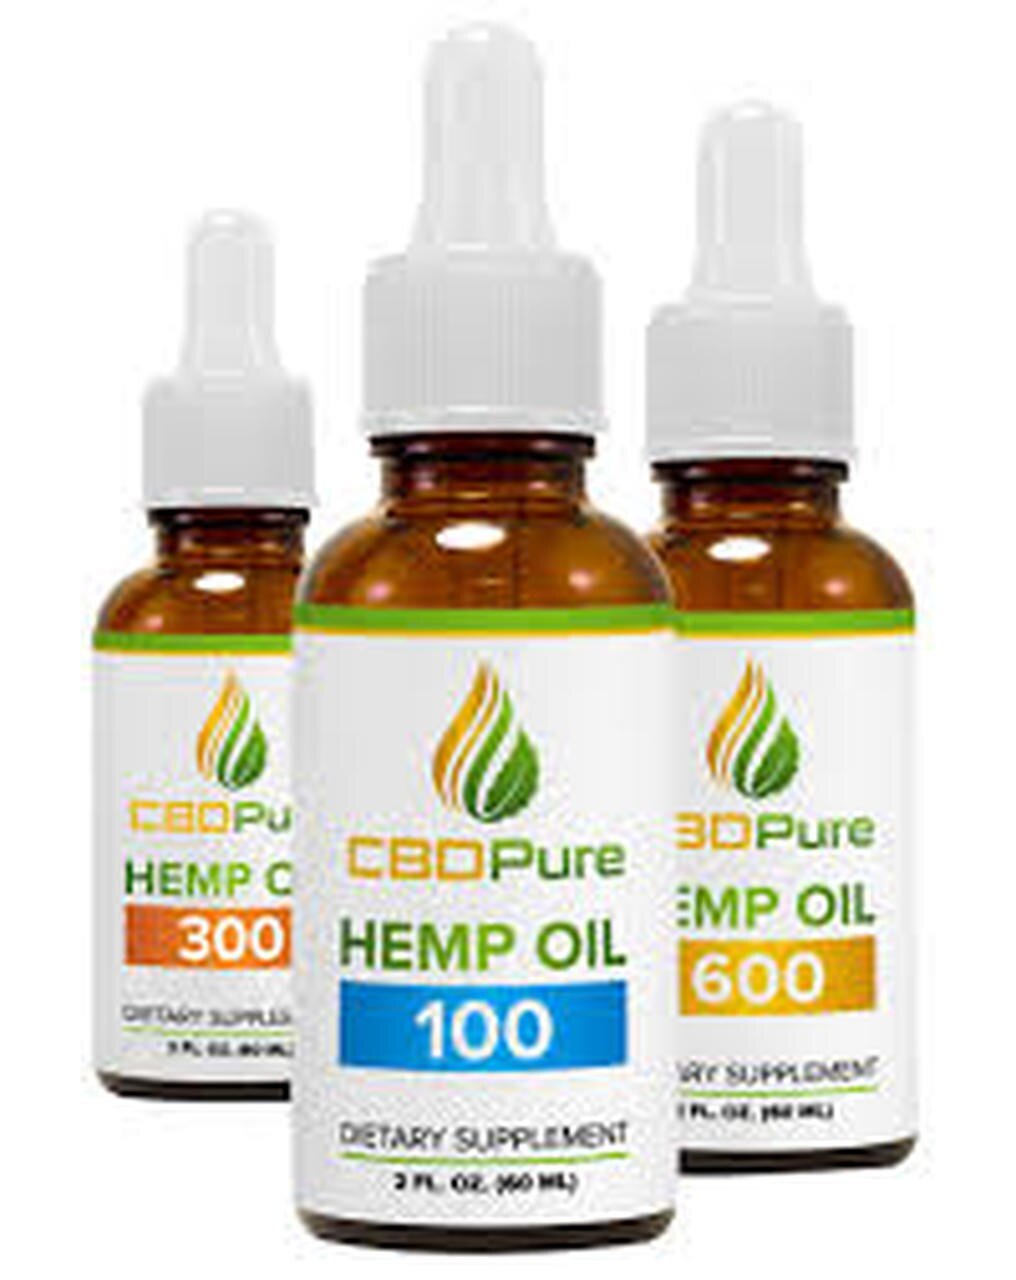 Hemp Oil Suppliers